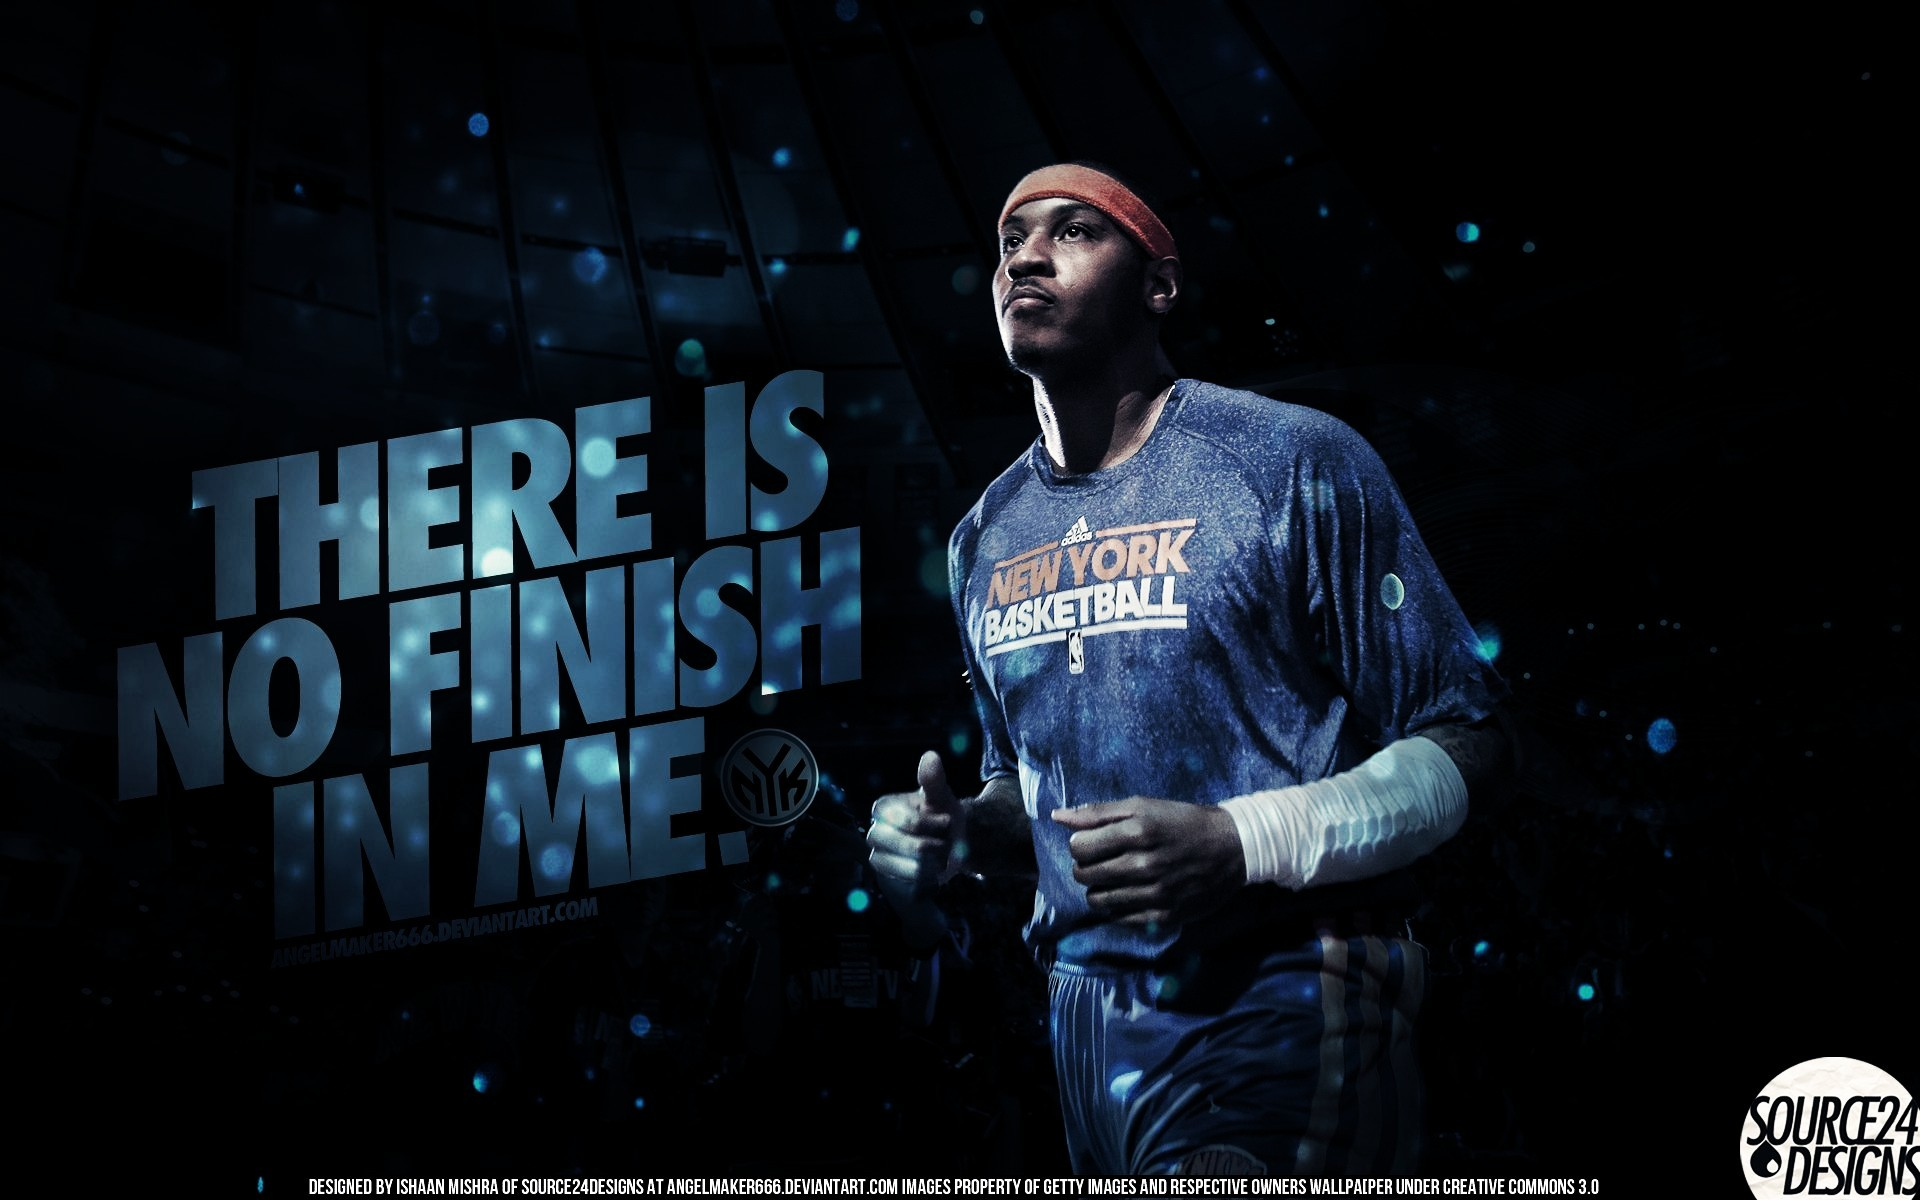 Nike Basketball Wallpapers For Laptops 3108 – HD Wallpaper Site